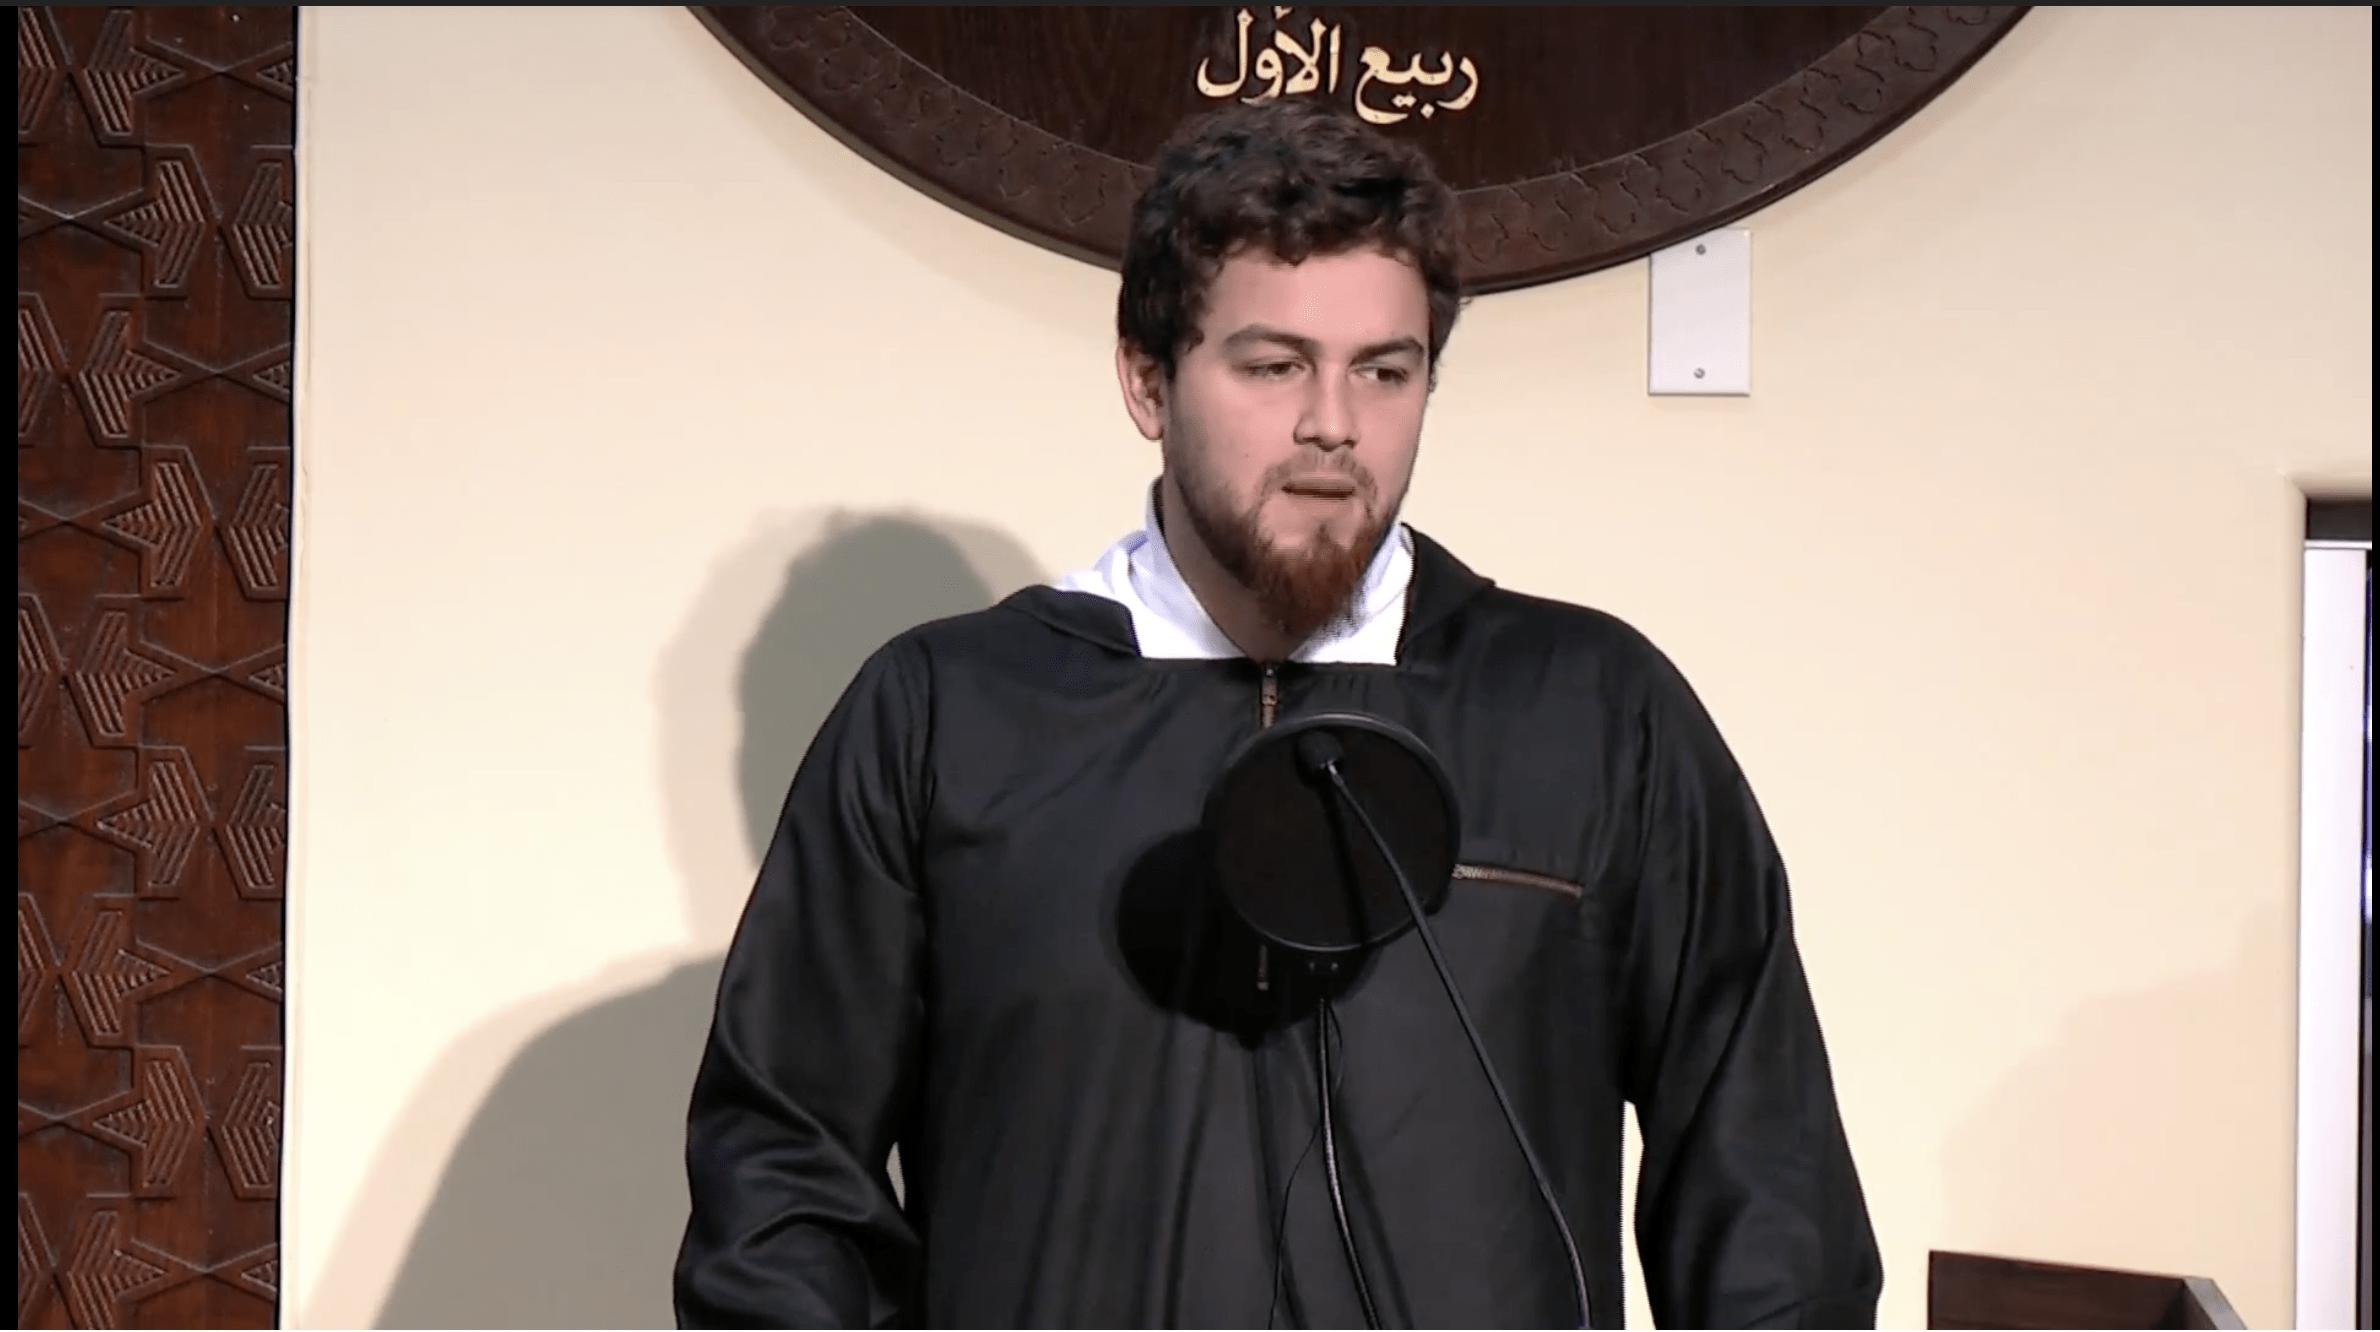 AbdelRahman Murphy – Tawba (Repentance)